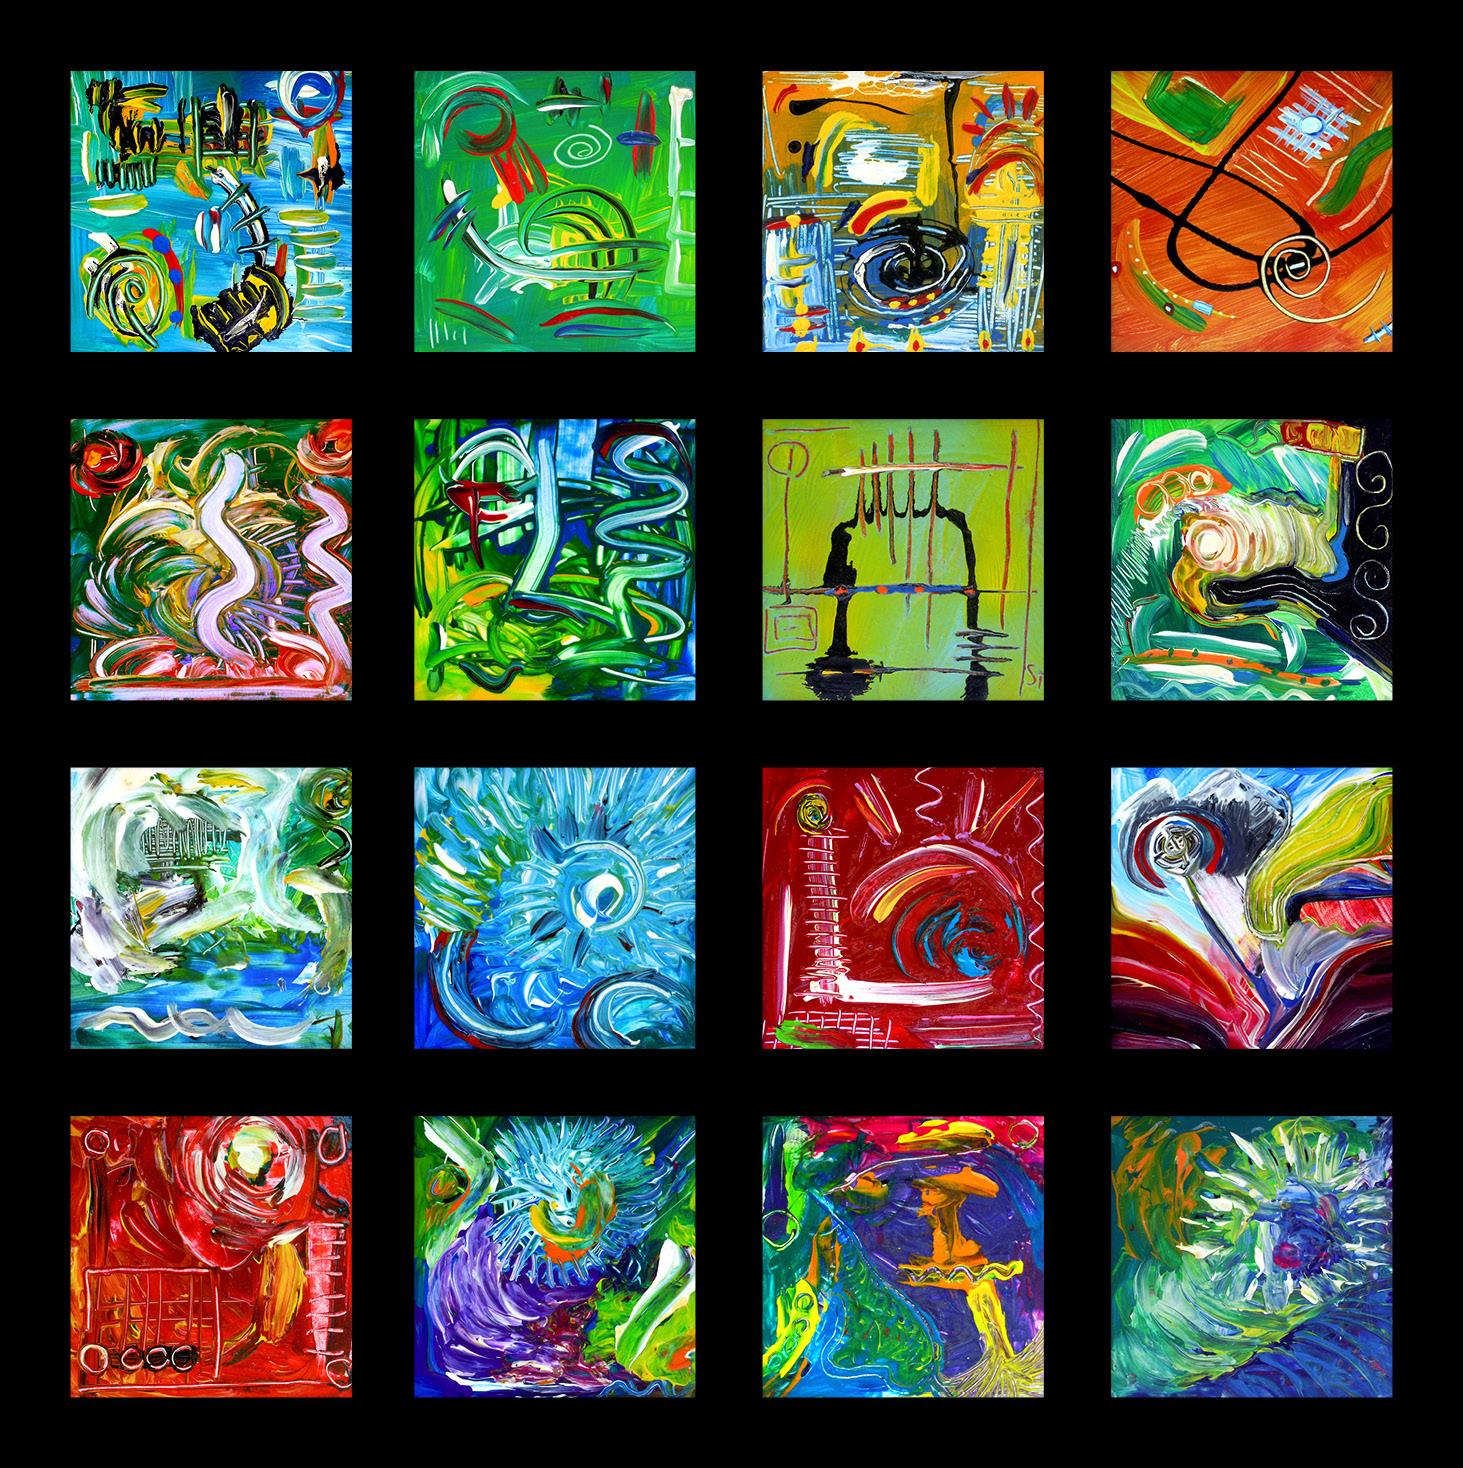 Kunstquadrate, Stefan Hallerbach, Acrylmalerei